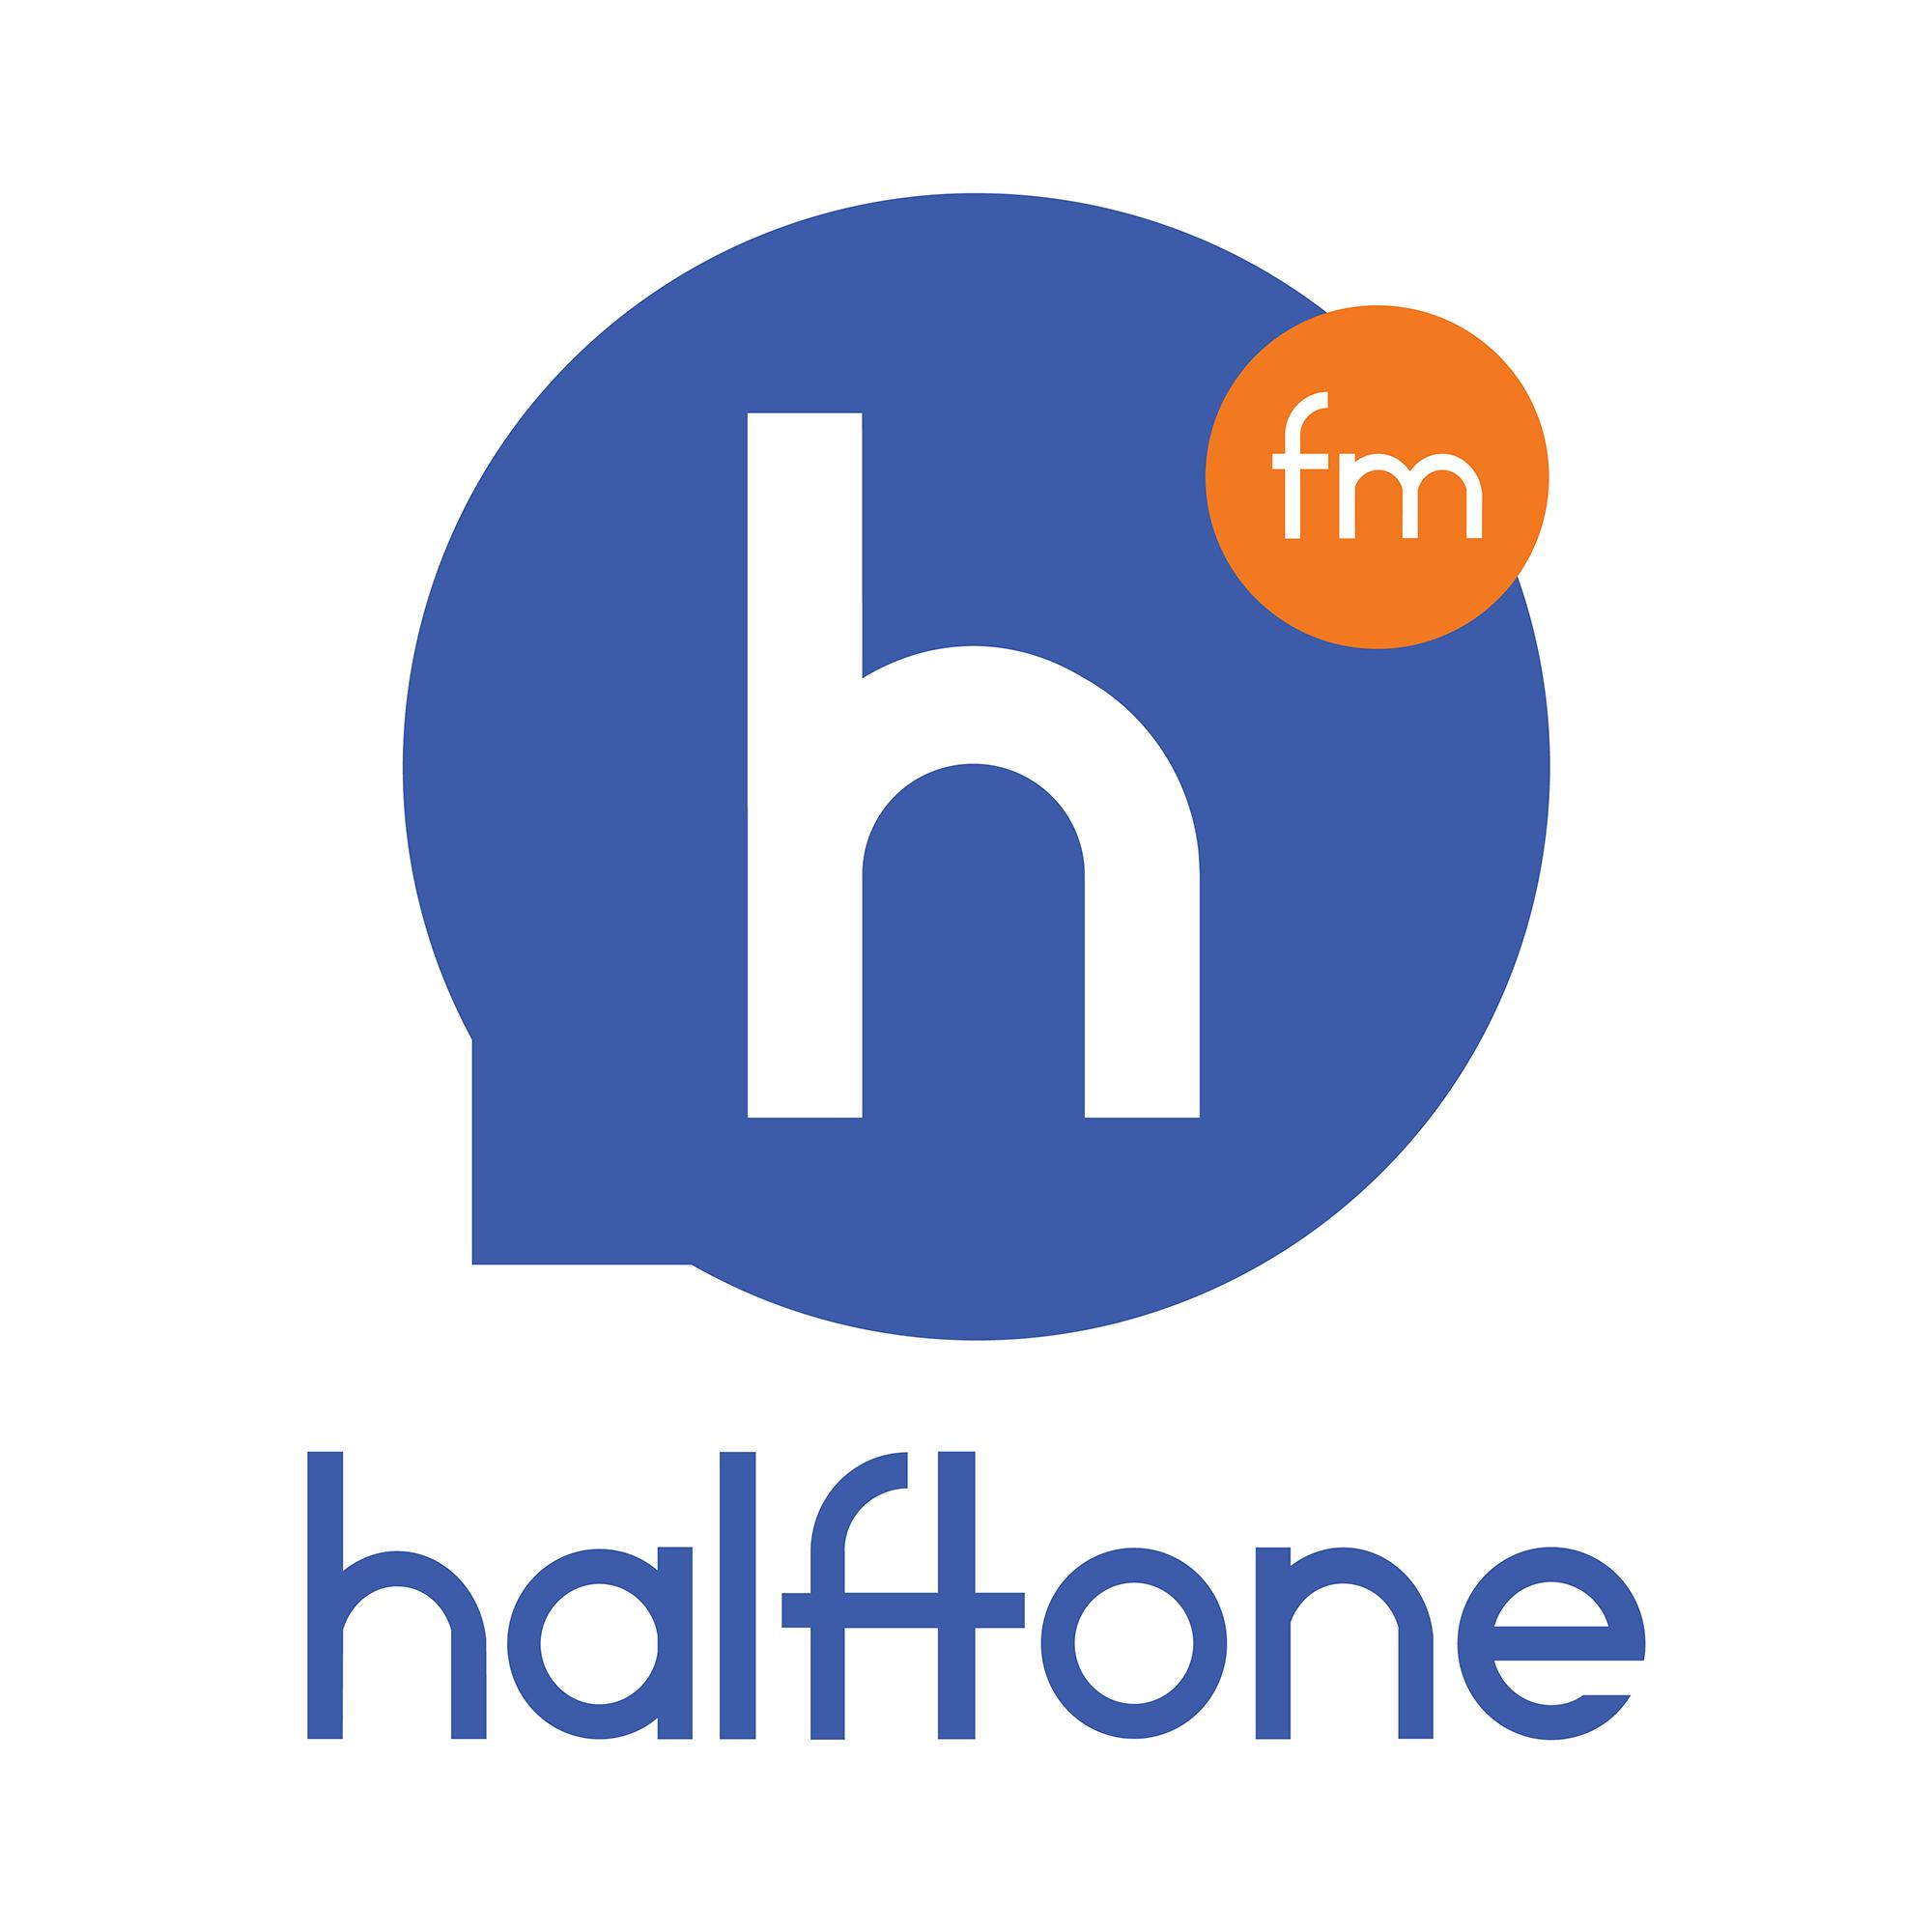 halftone.fm